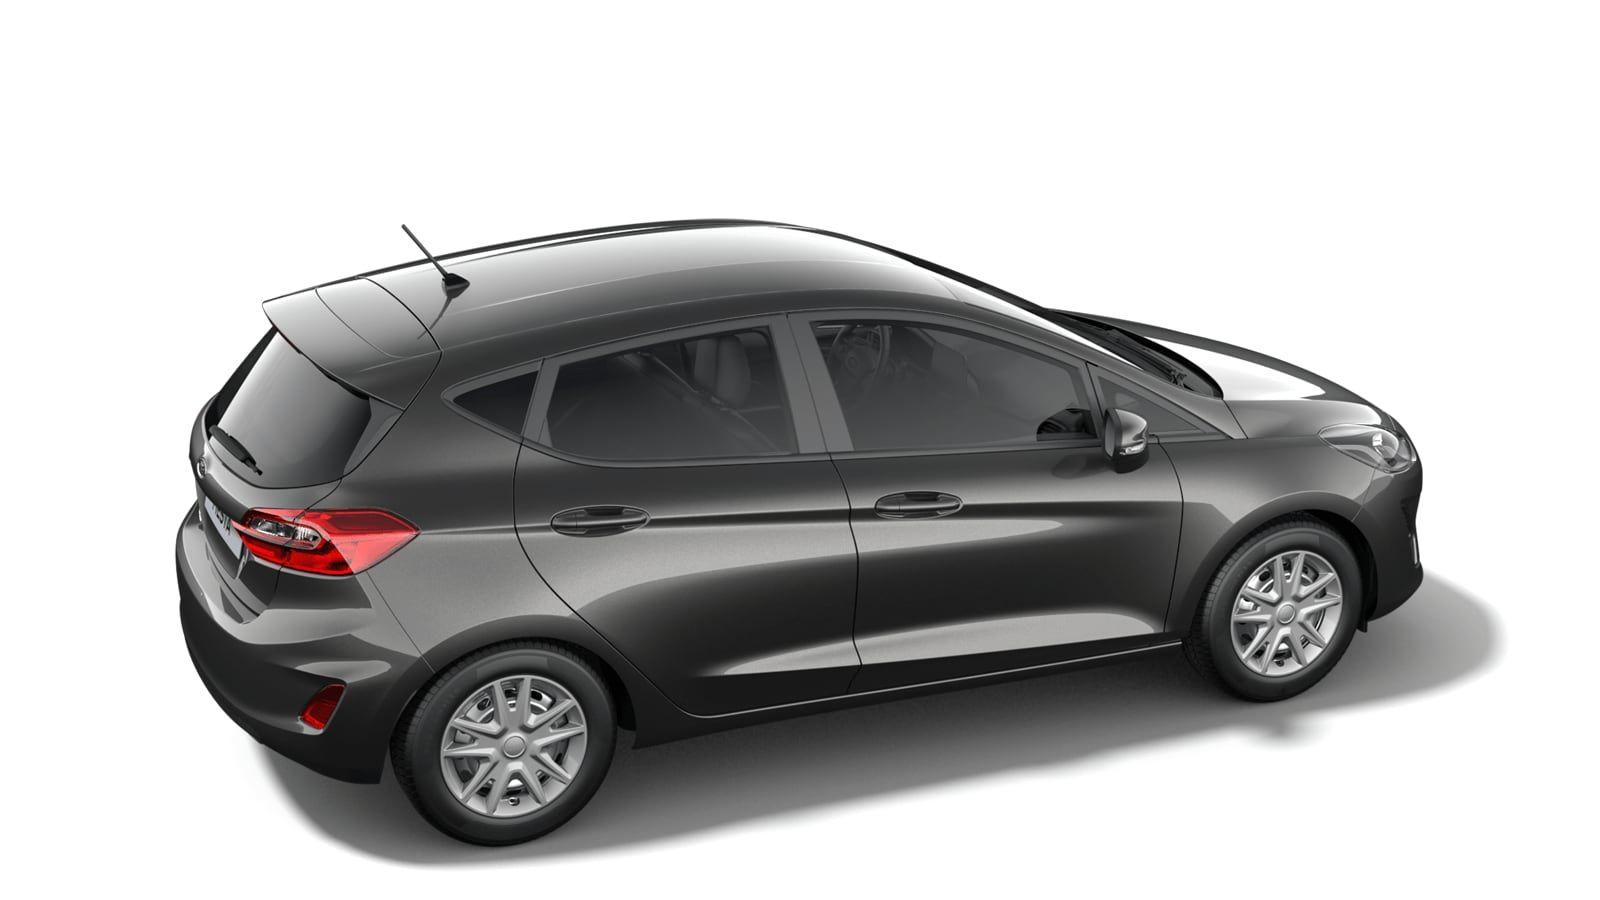 Nieuw Ford Fiesta van b479 Trend 1.1 Ti-VCT 75pk/ch (63KW) M5 Euro 6d A5B - Magnetic 2